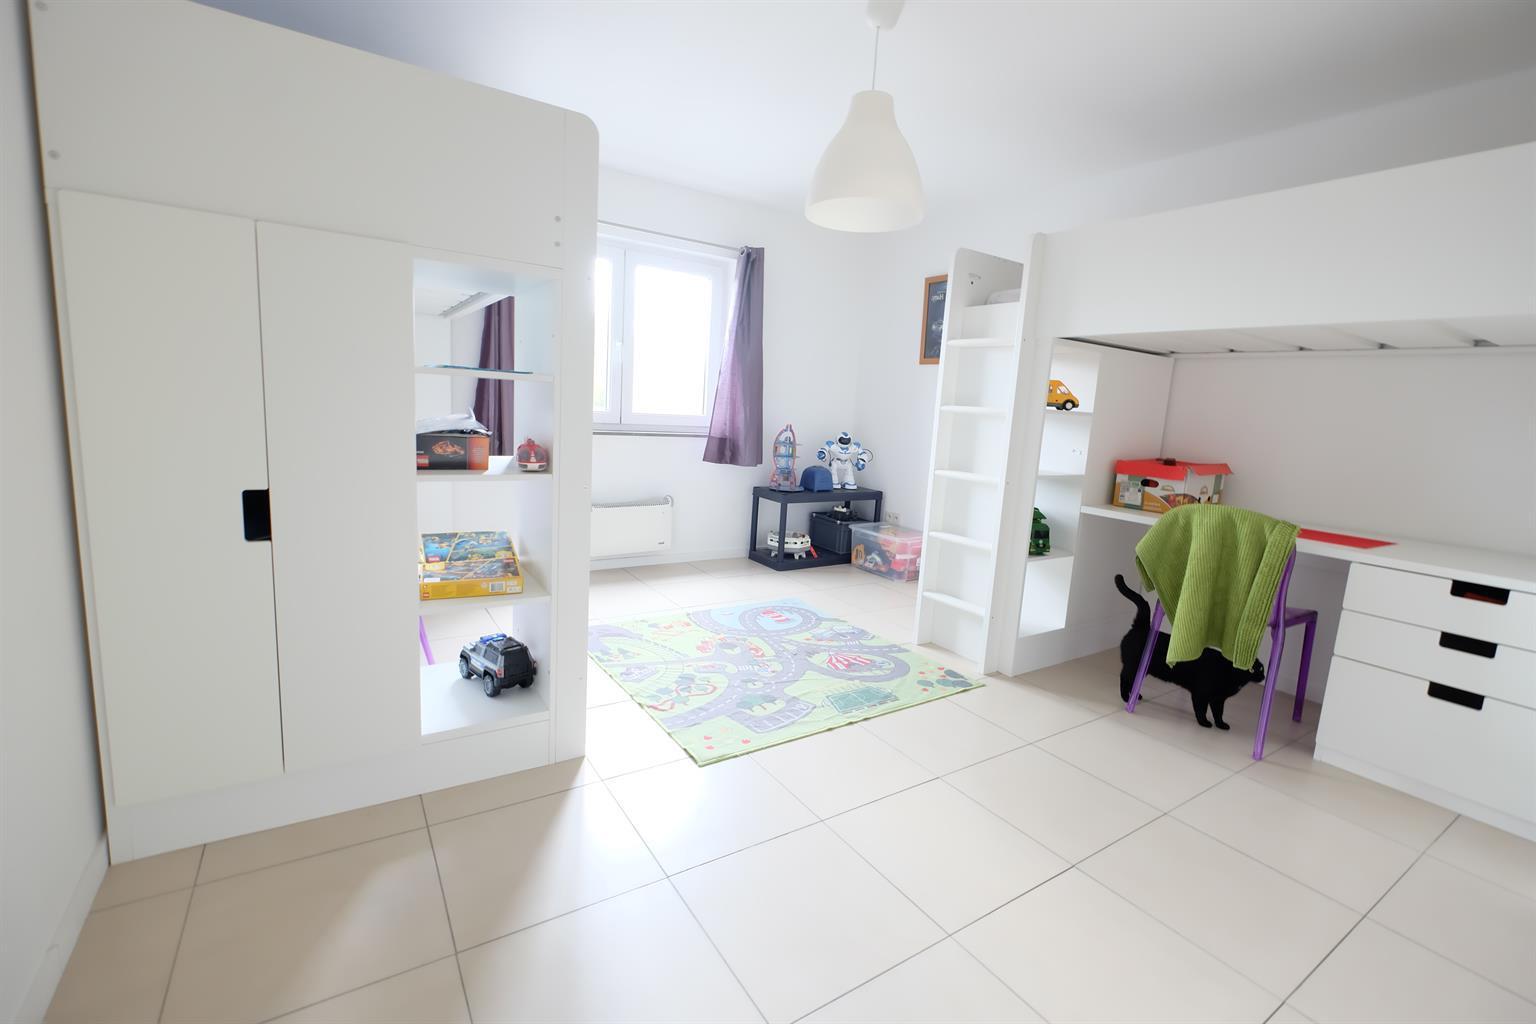 Duplex - Braine-le-Comte - #4384185-9